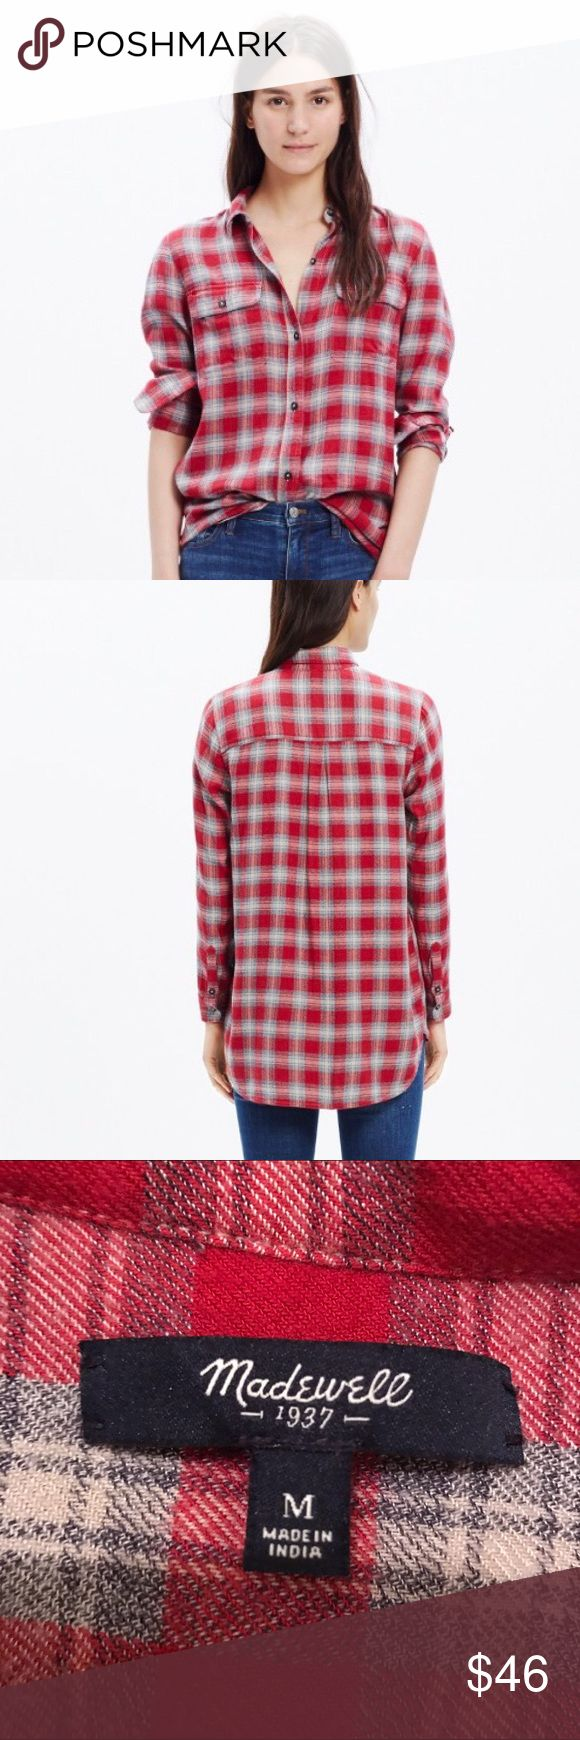 Madewell Ex-Boyfriend Plaid Shirt Madewell plaid-button down shirt in a super soft fabric. Shirttail hem. Only worn a couple times - great condition! Madewell Tops Button Down Shirts